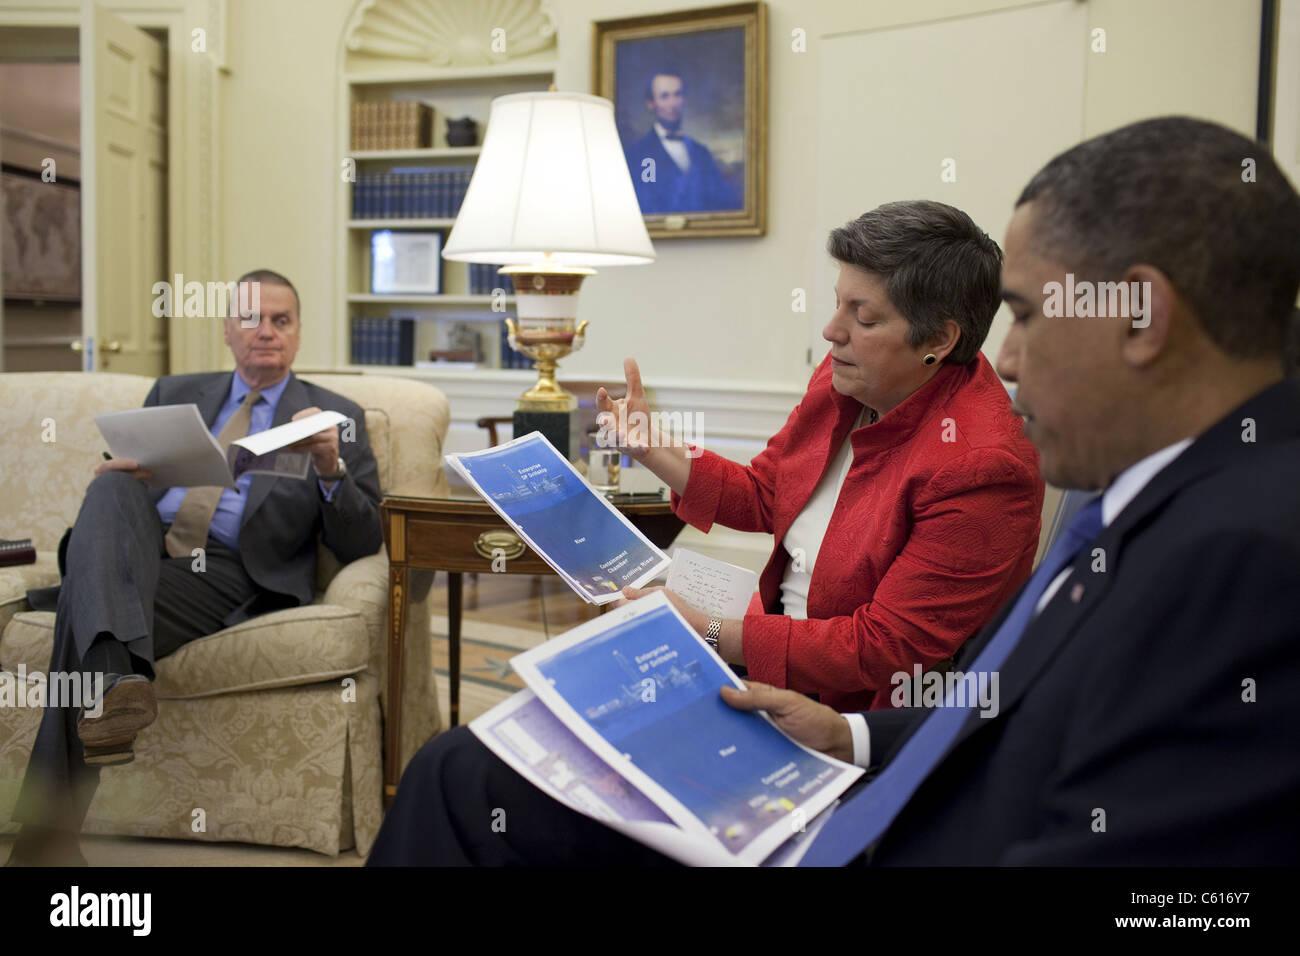 Präsident Obama trifft sich mit Homeland Security Secretary Janet Napolitano und National Security Advisor Stockbild